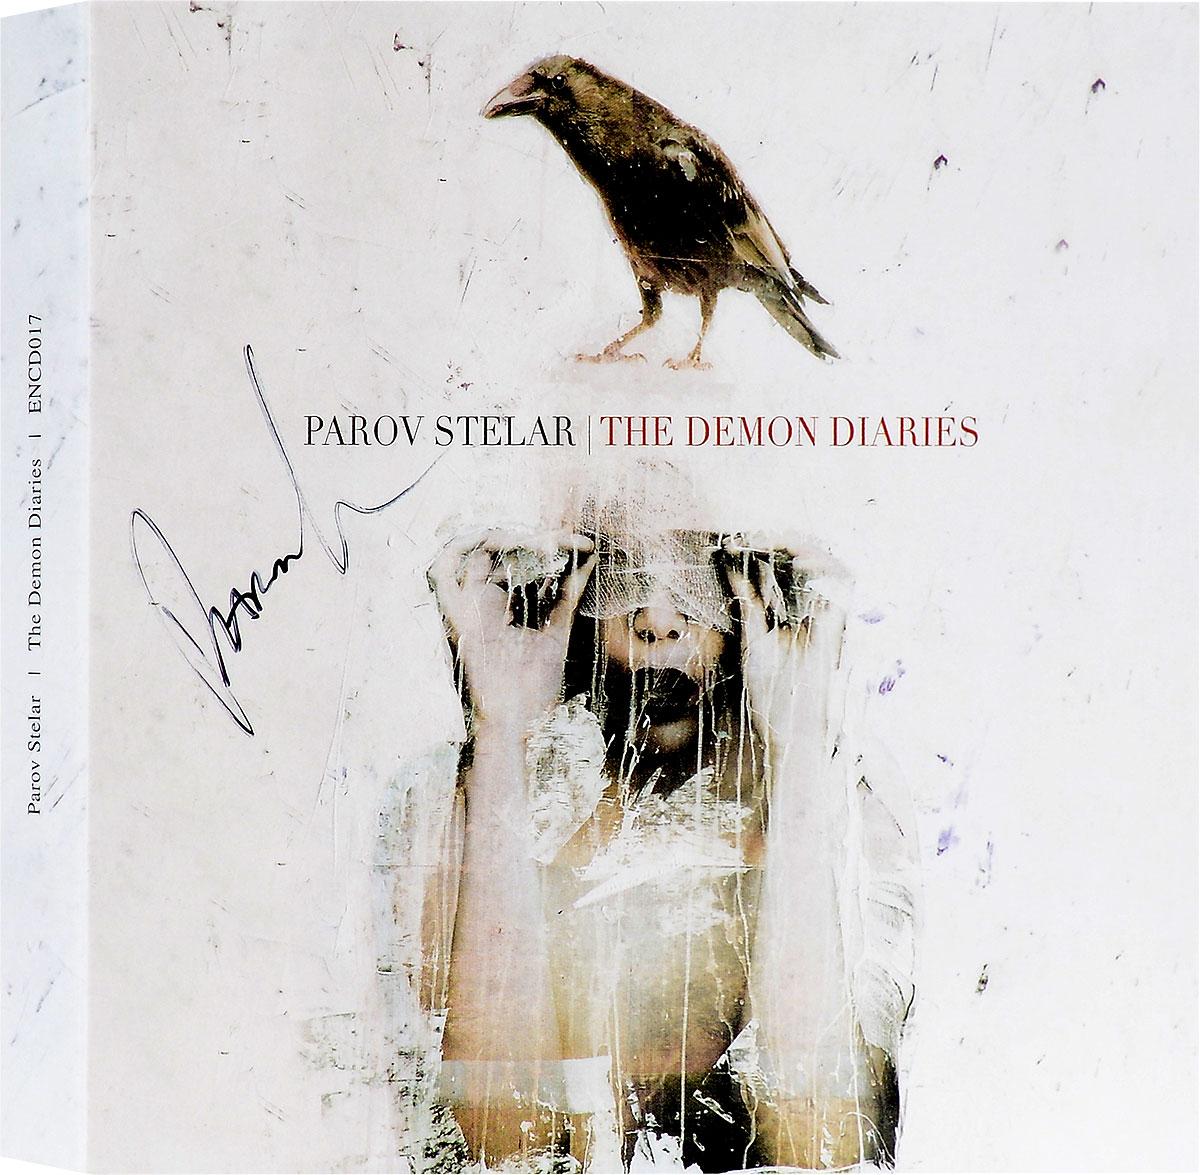 Parov Stelar. The Demon Diaries. С автографом (2 CD) 2015 2 Audio CD